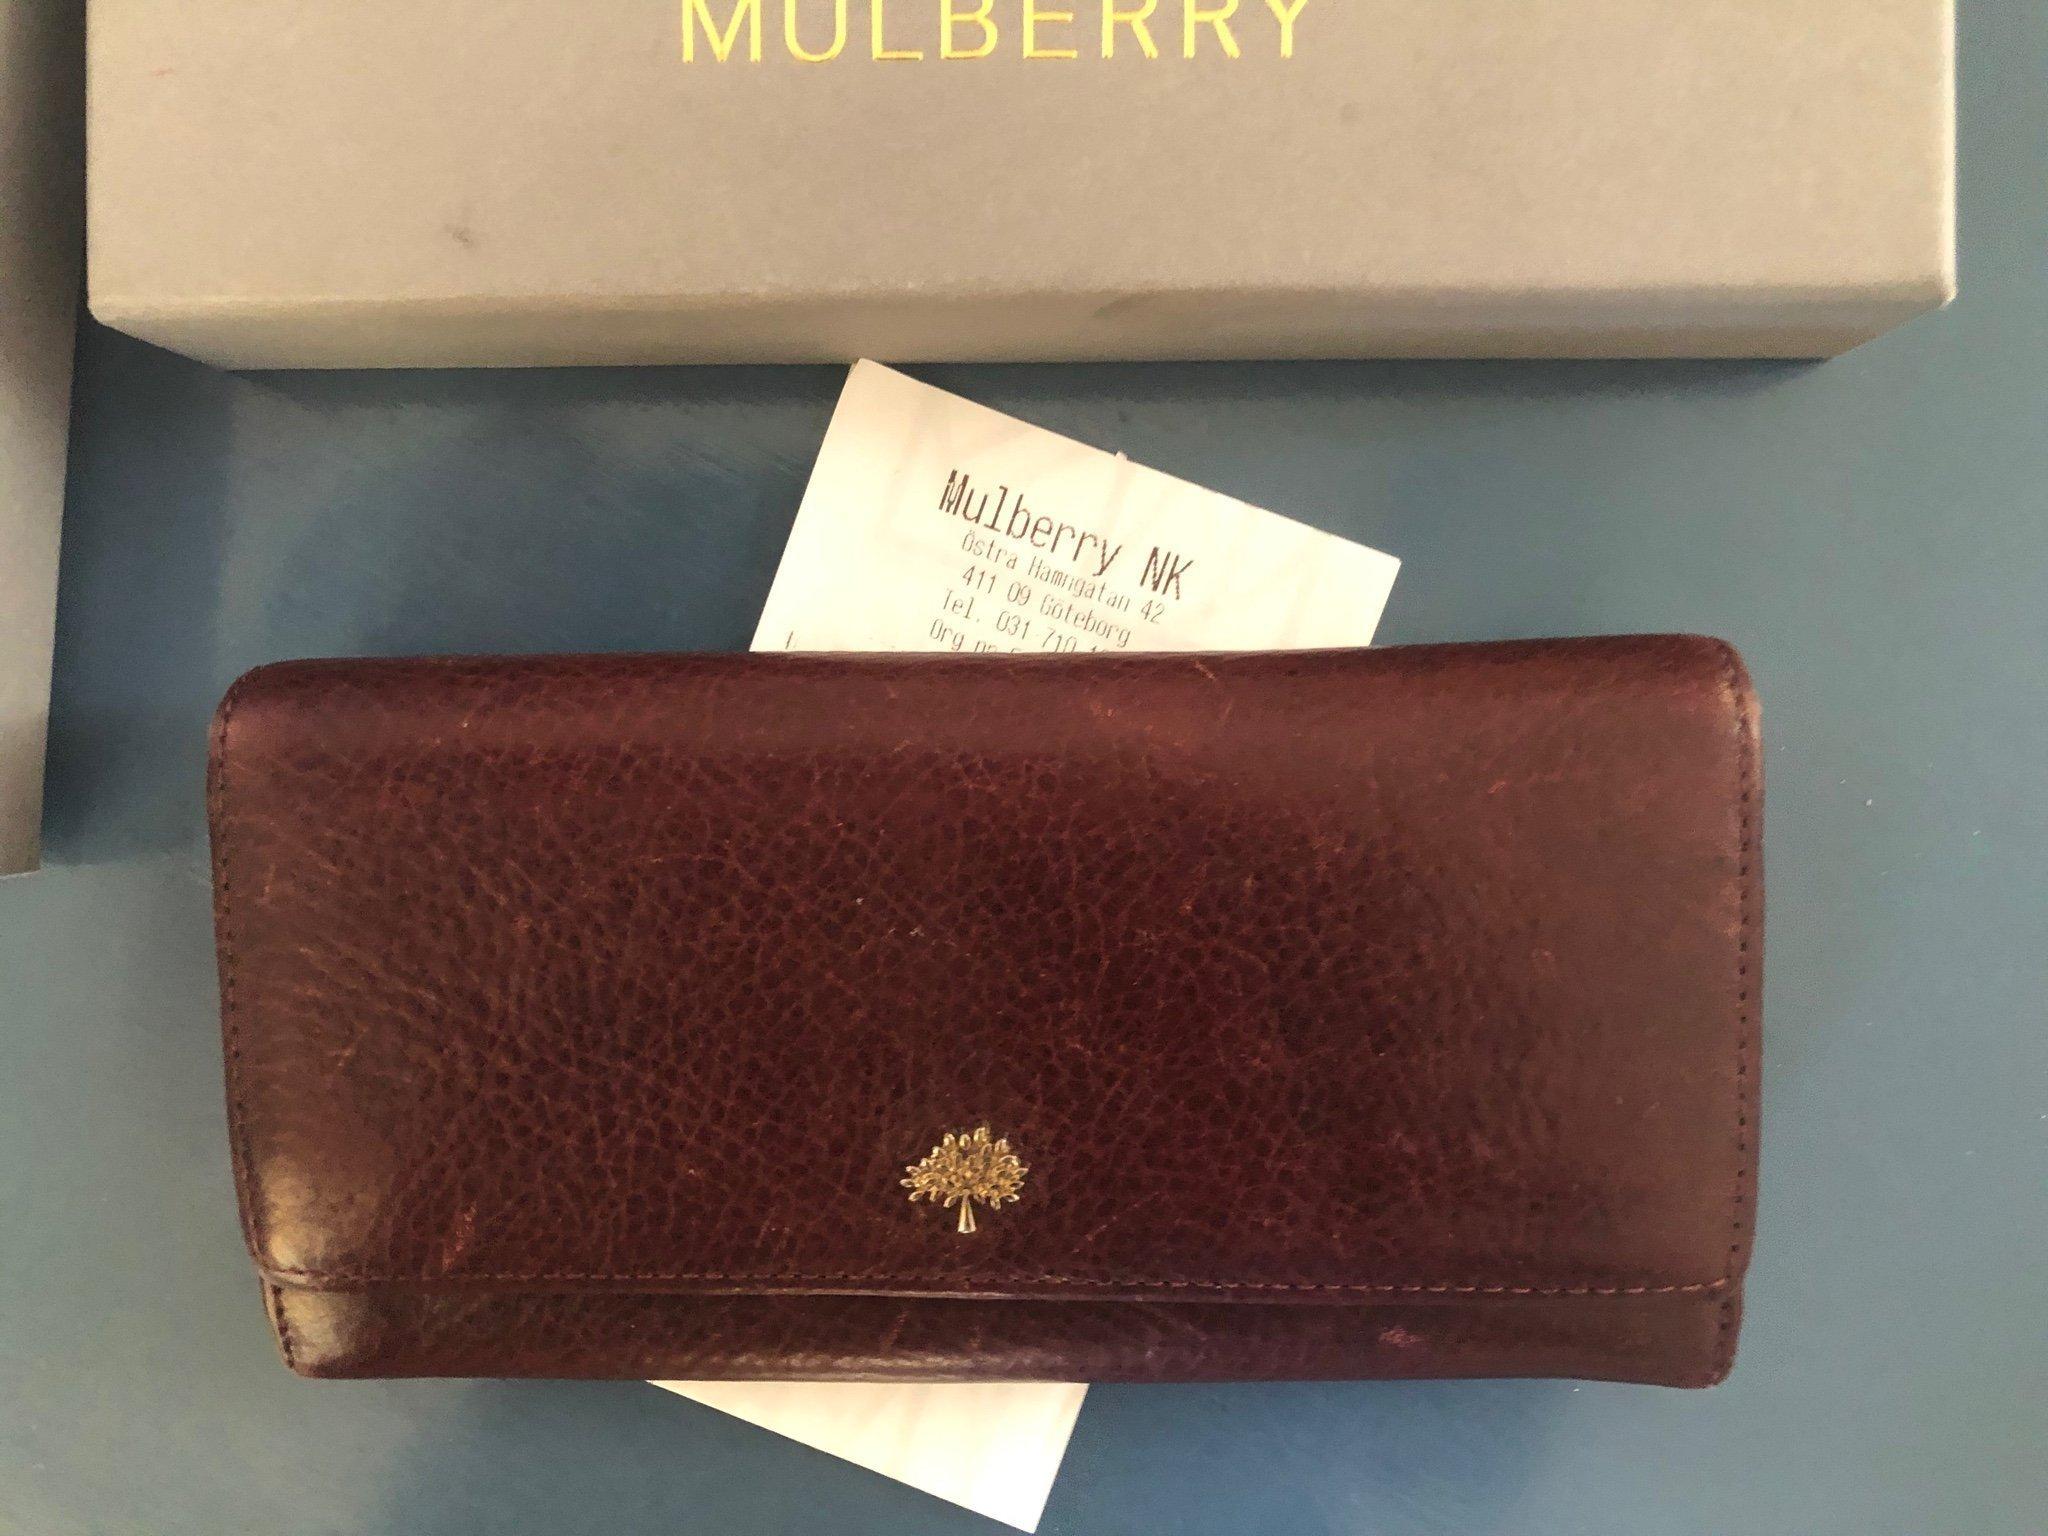 mulberry nk göteborg